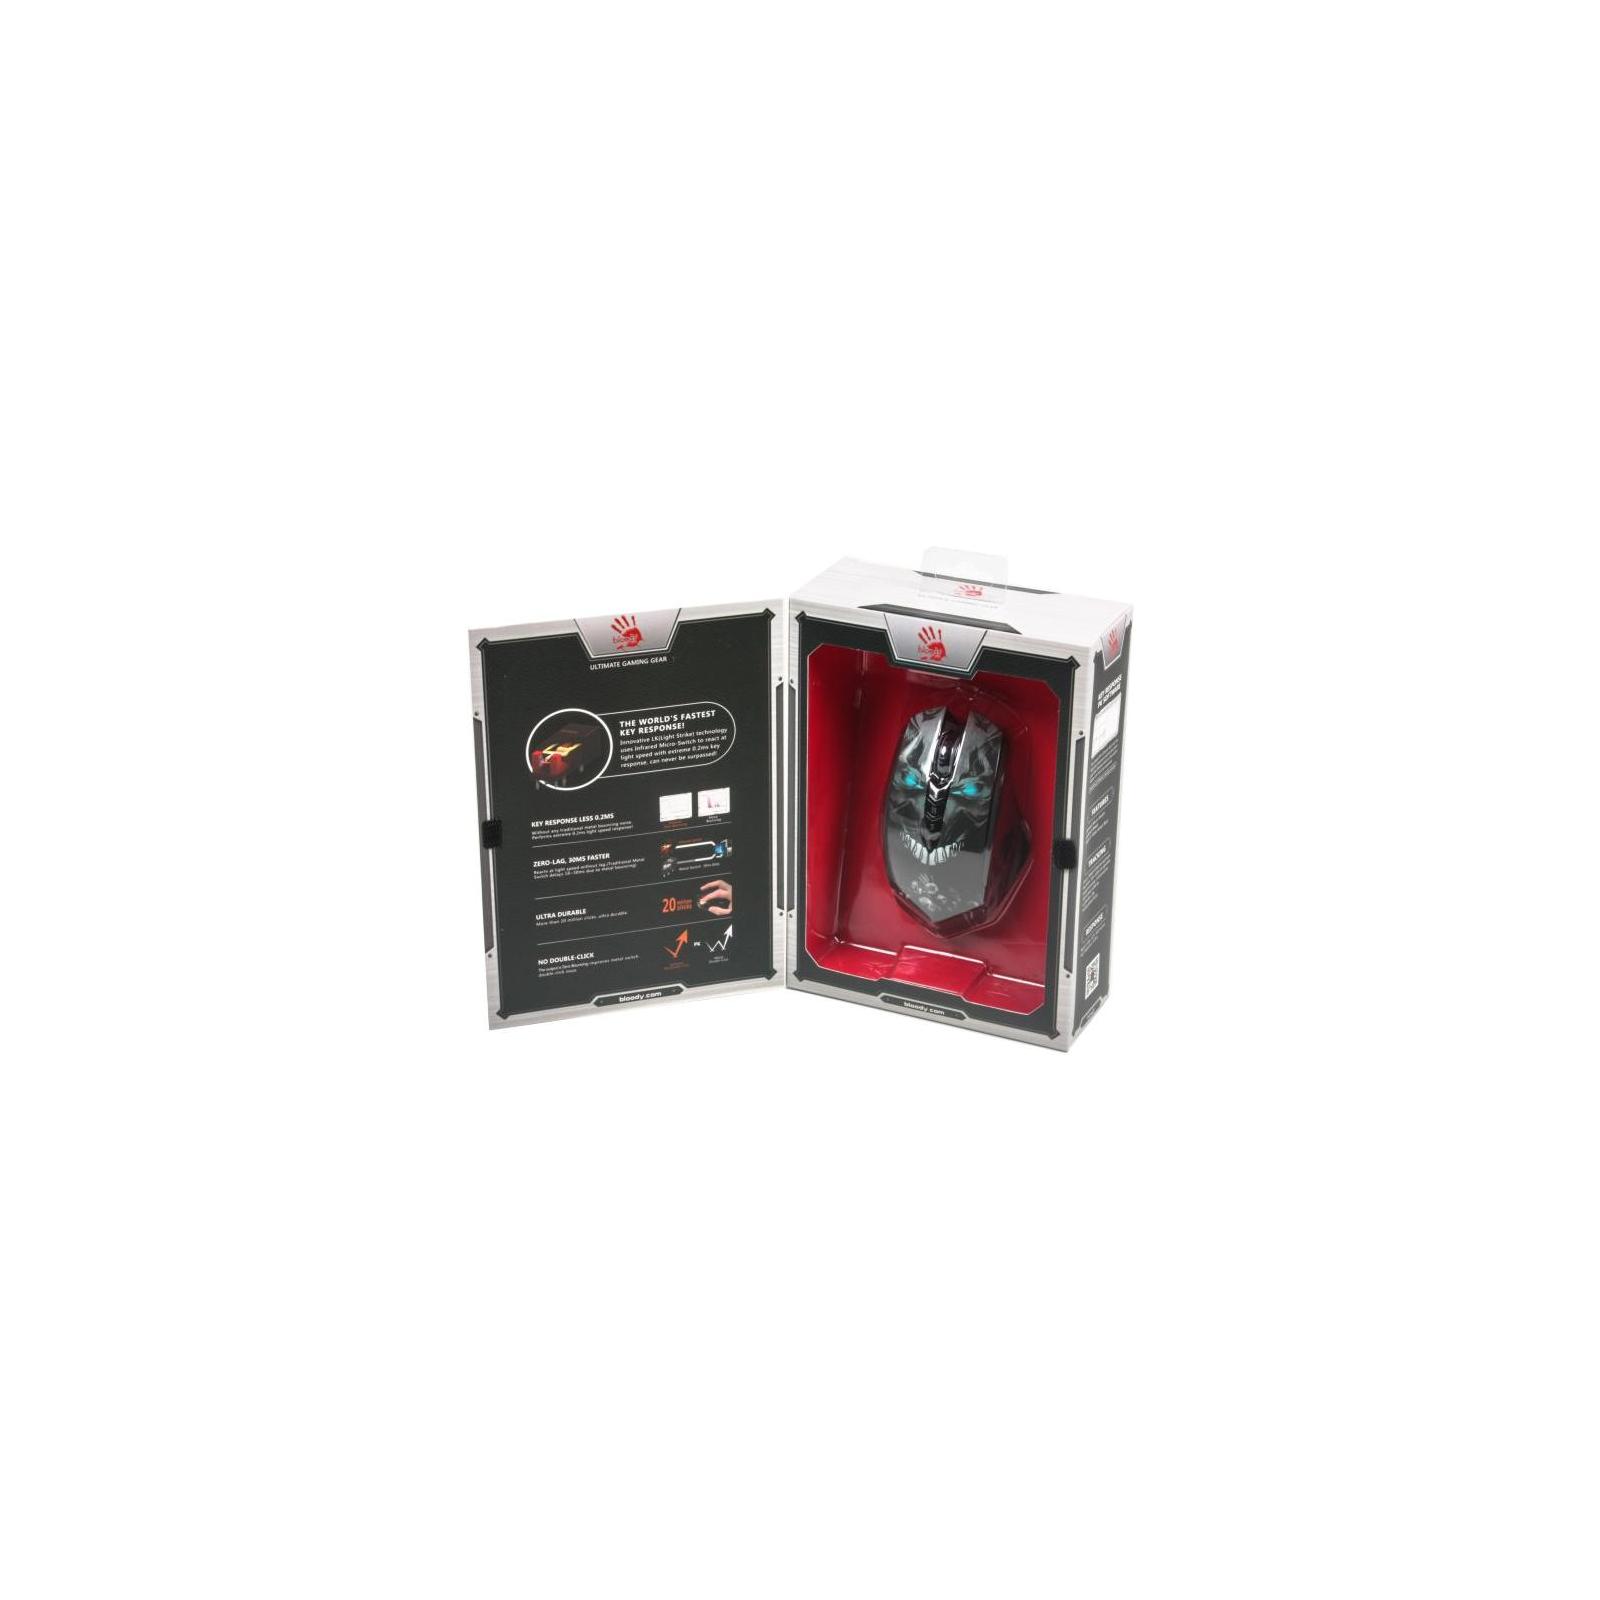 Мышка A4tech Bloody R80A Skull изображение 5